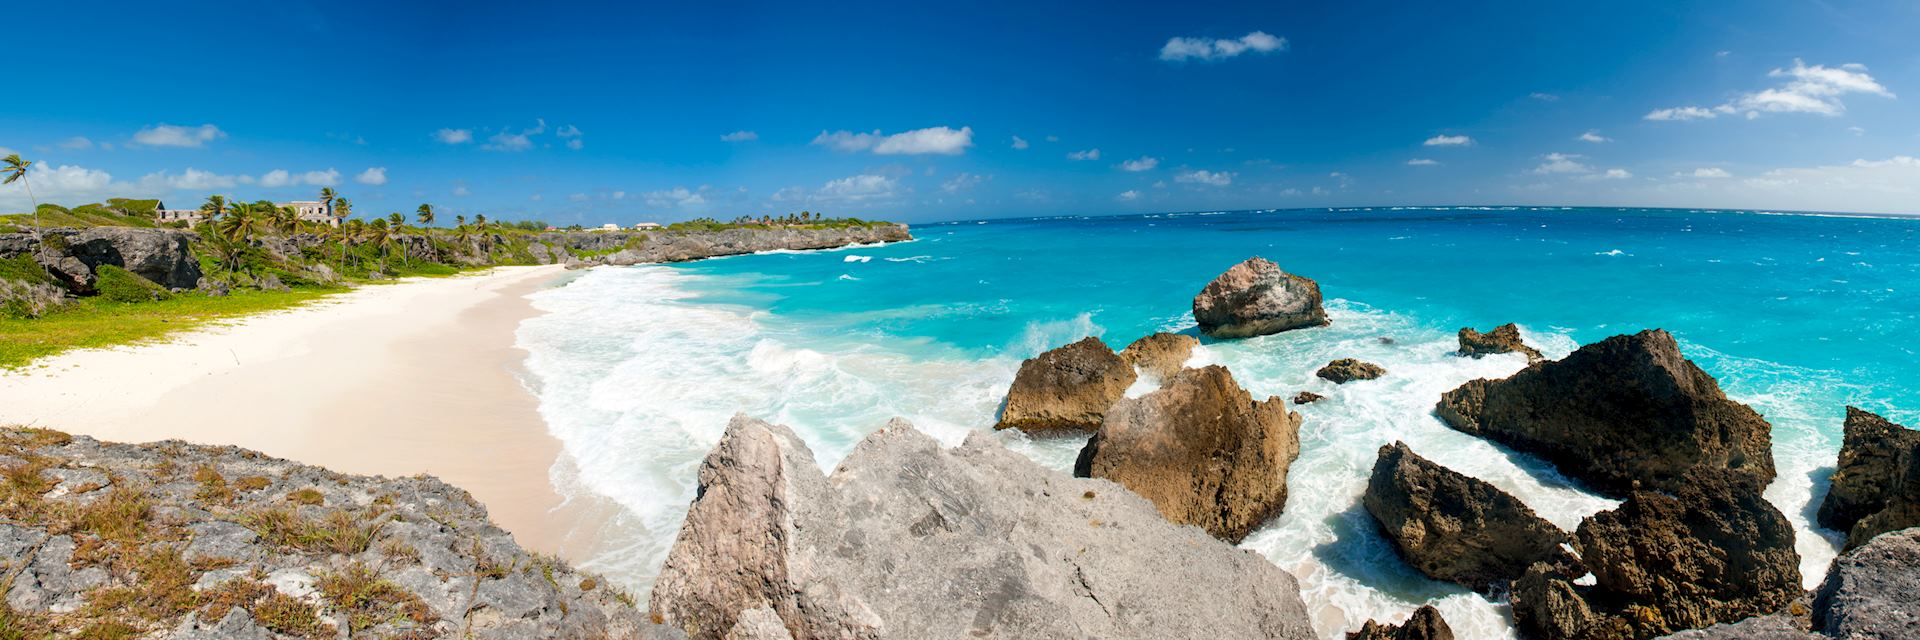 Harrismith Beach, Barbados